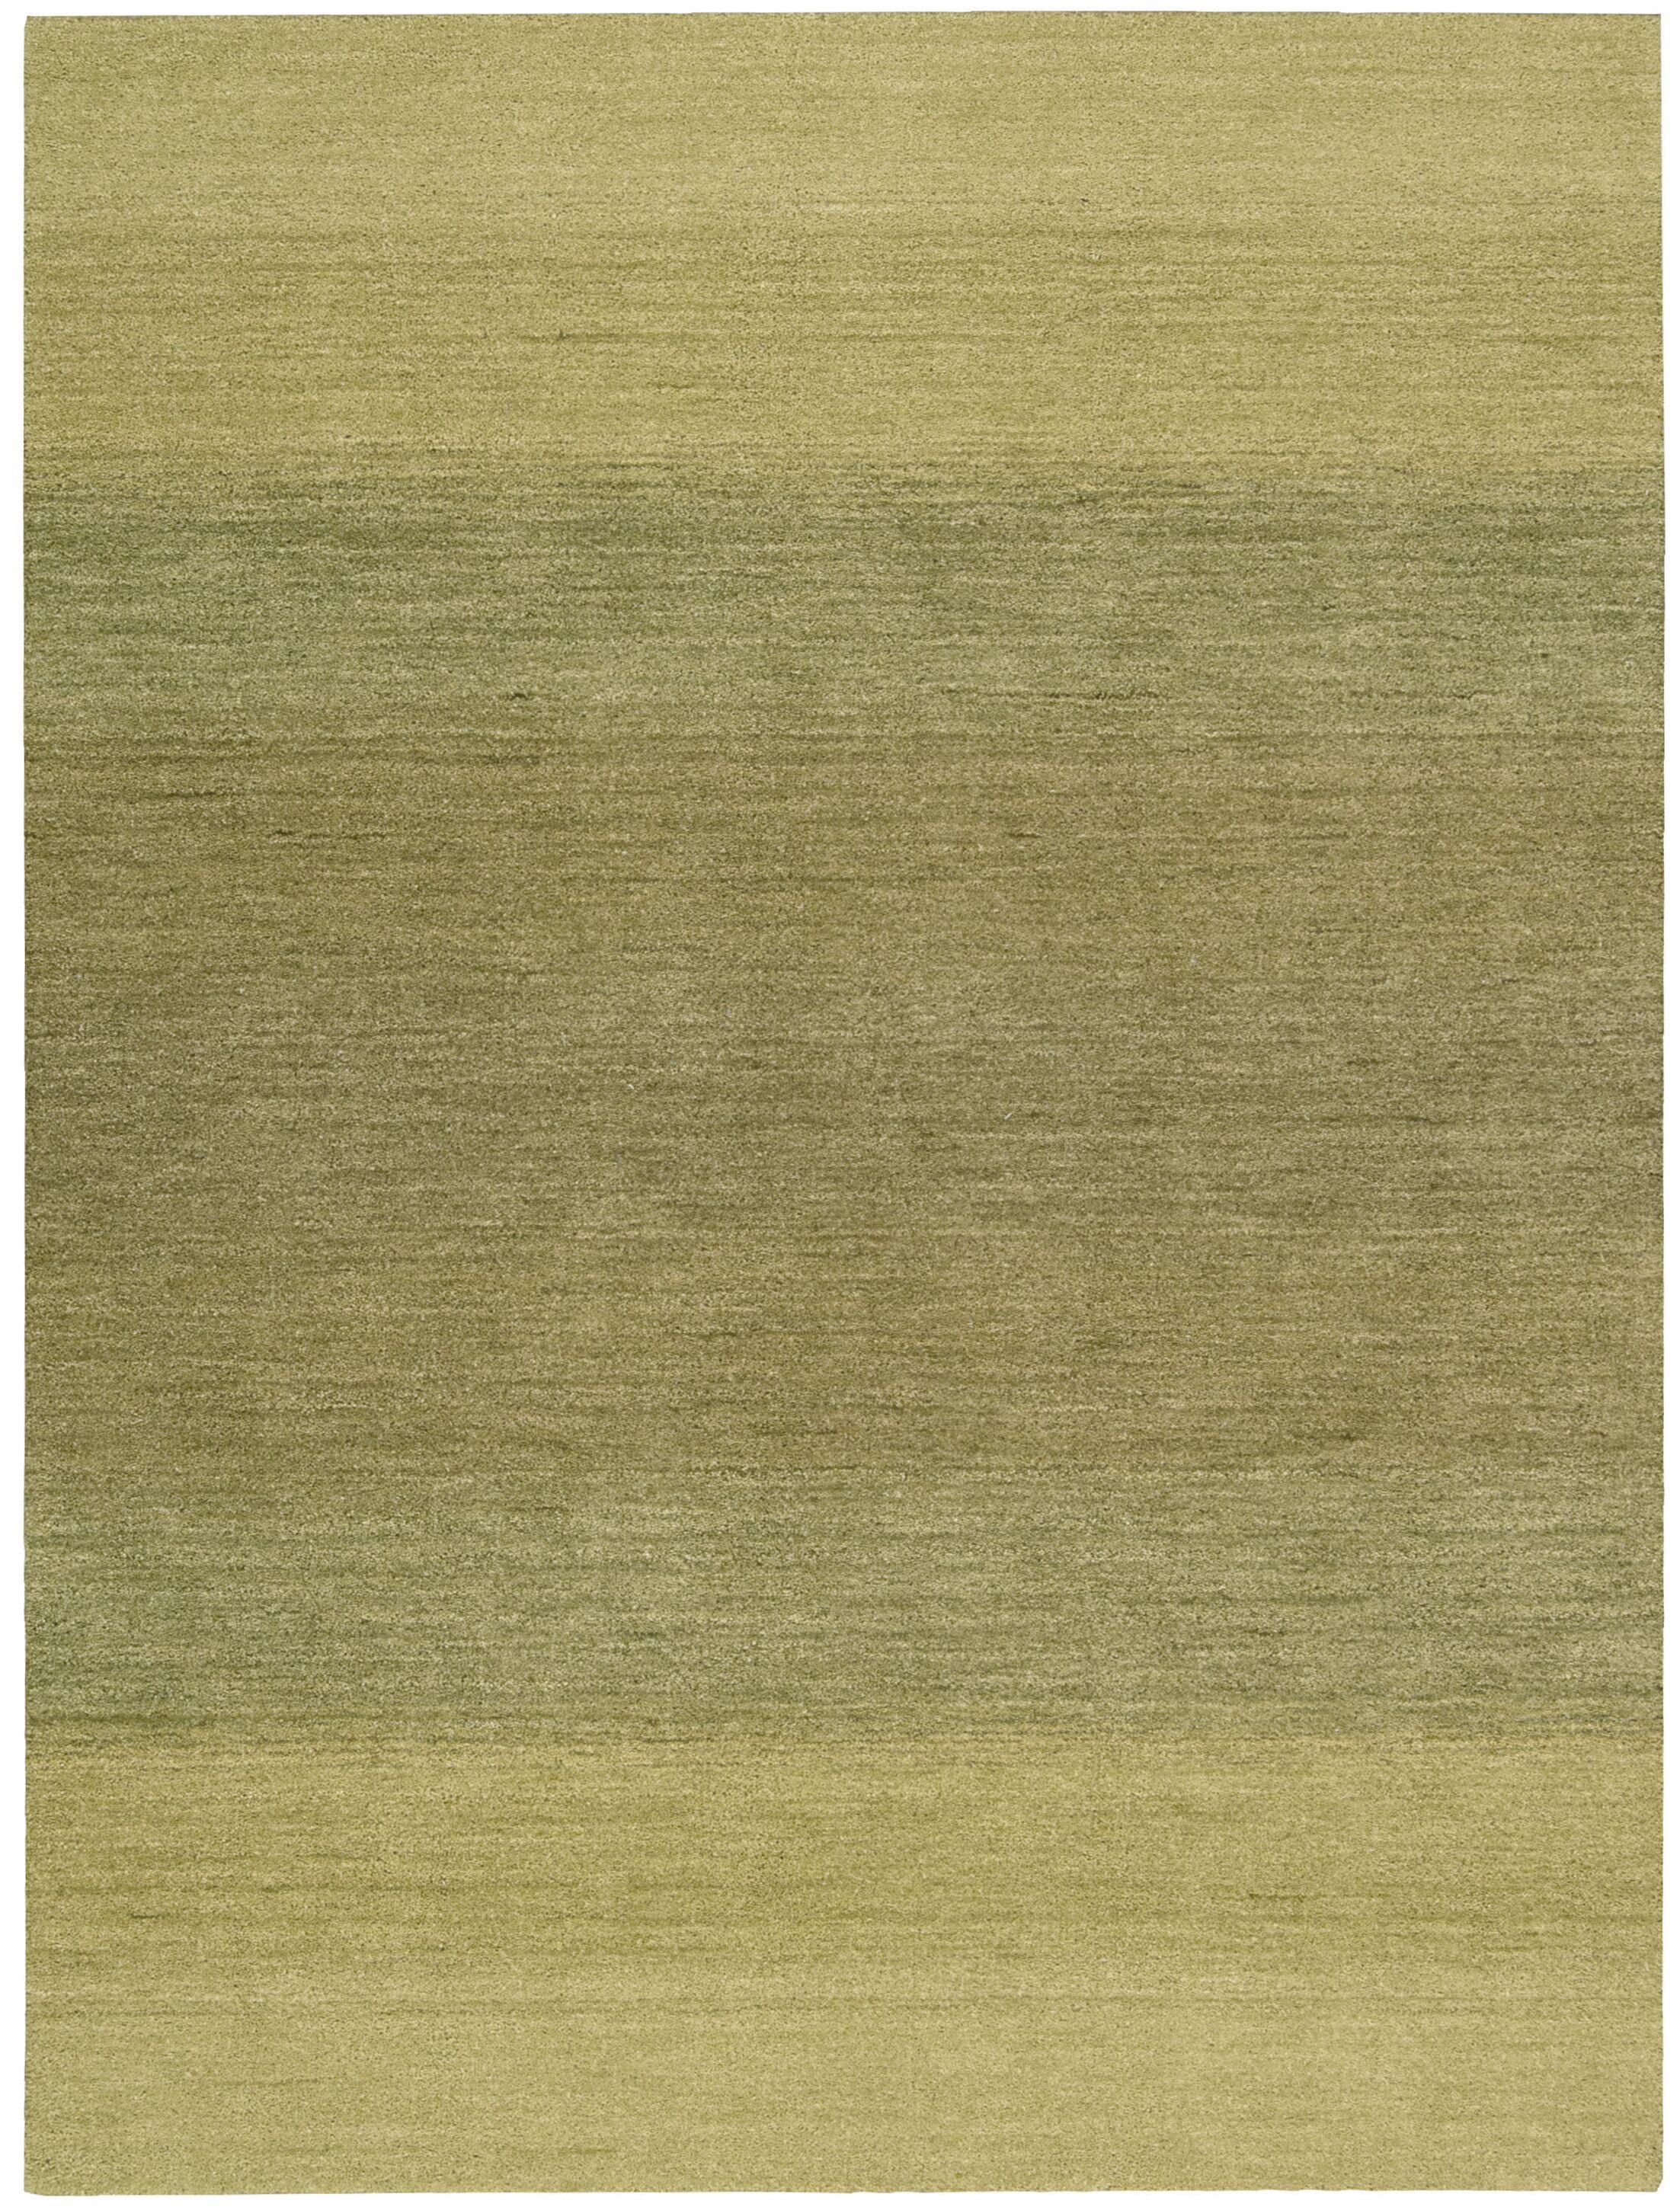 Linear Glow Hand-Woven Watercolor Verbena Area Rug Rug Size: Rectangle 7'9